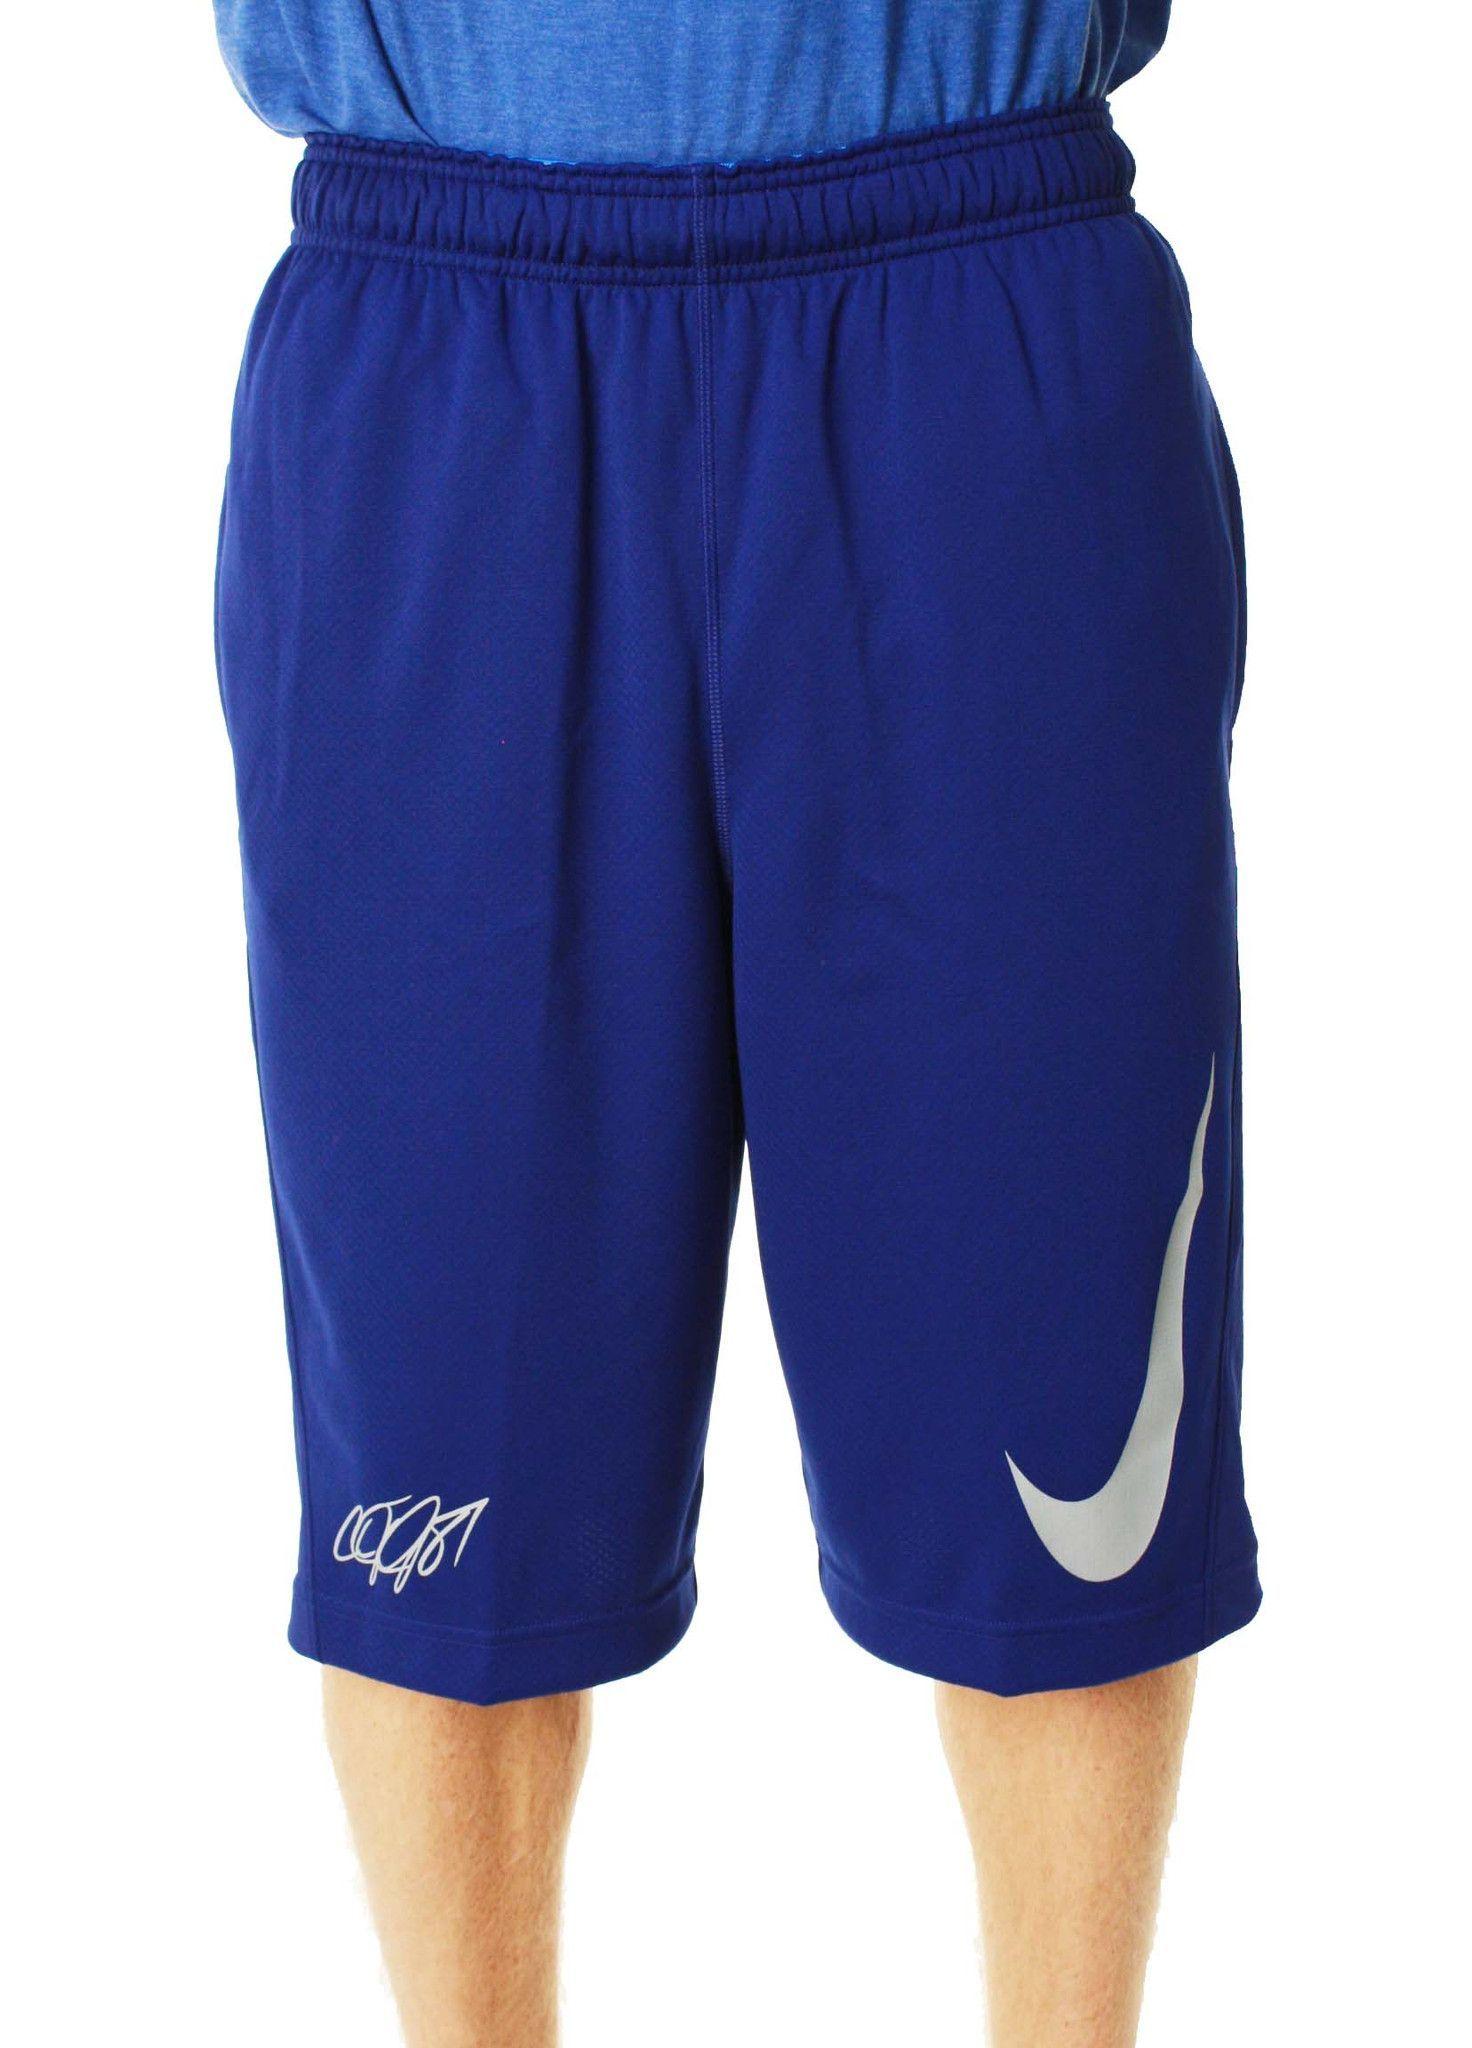 Nike Men's DriFit Fly Football Calvin Johnson Mesh Shorts